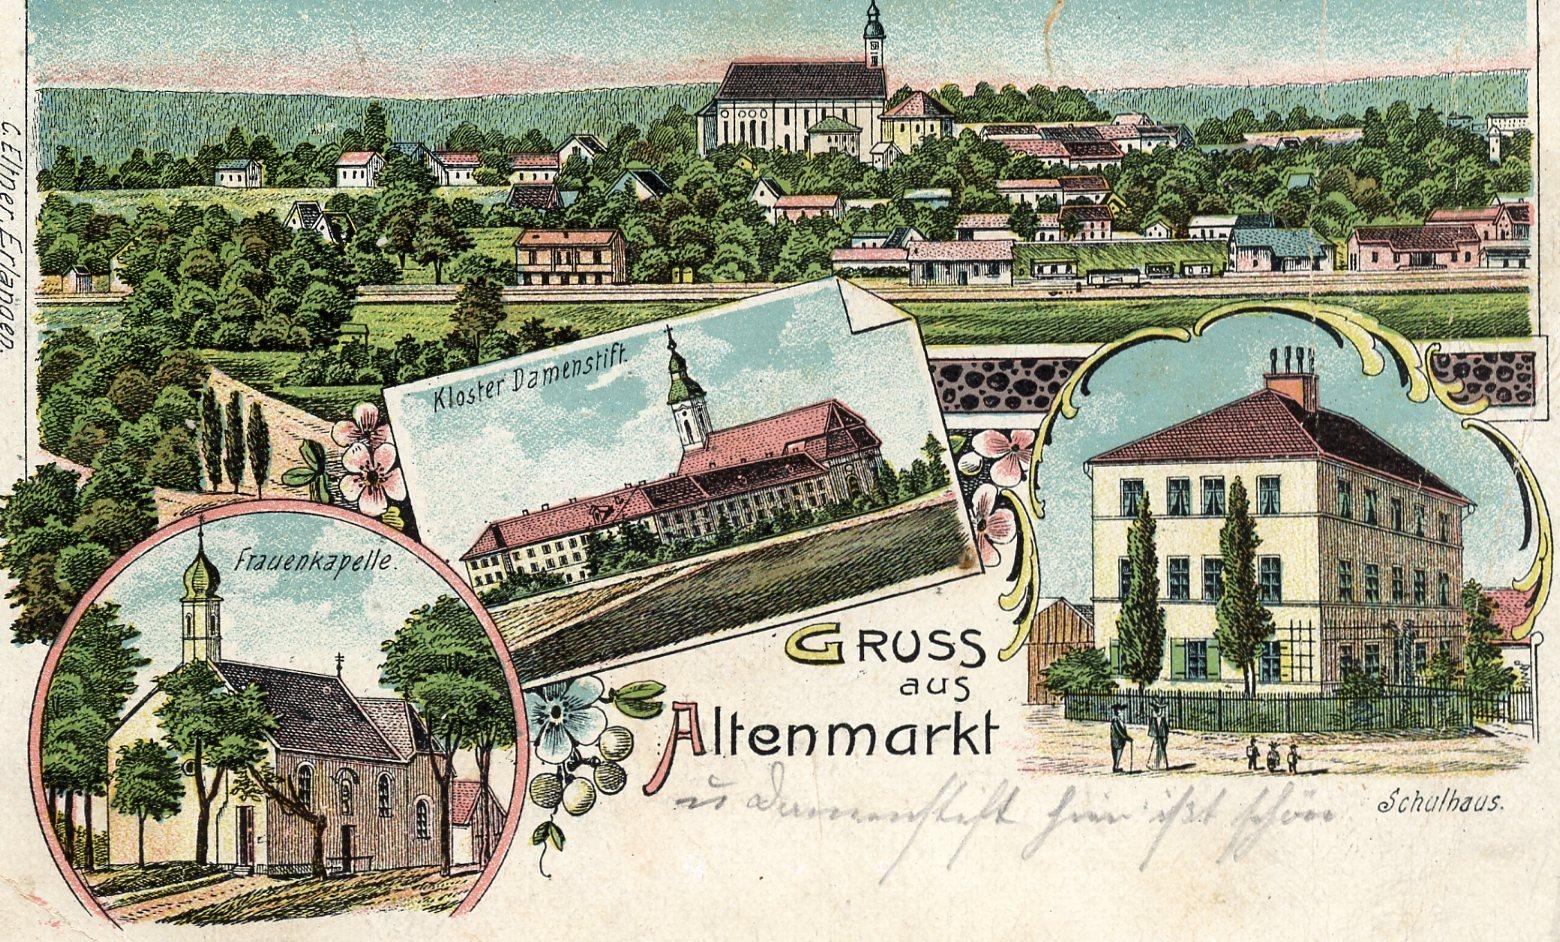 Postkarte aus dem Jahr ca. 1905